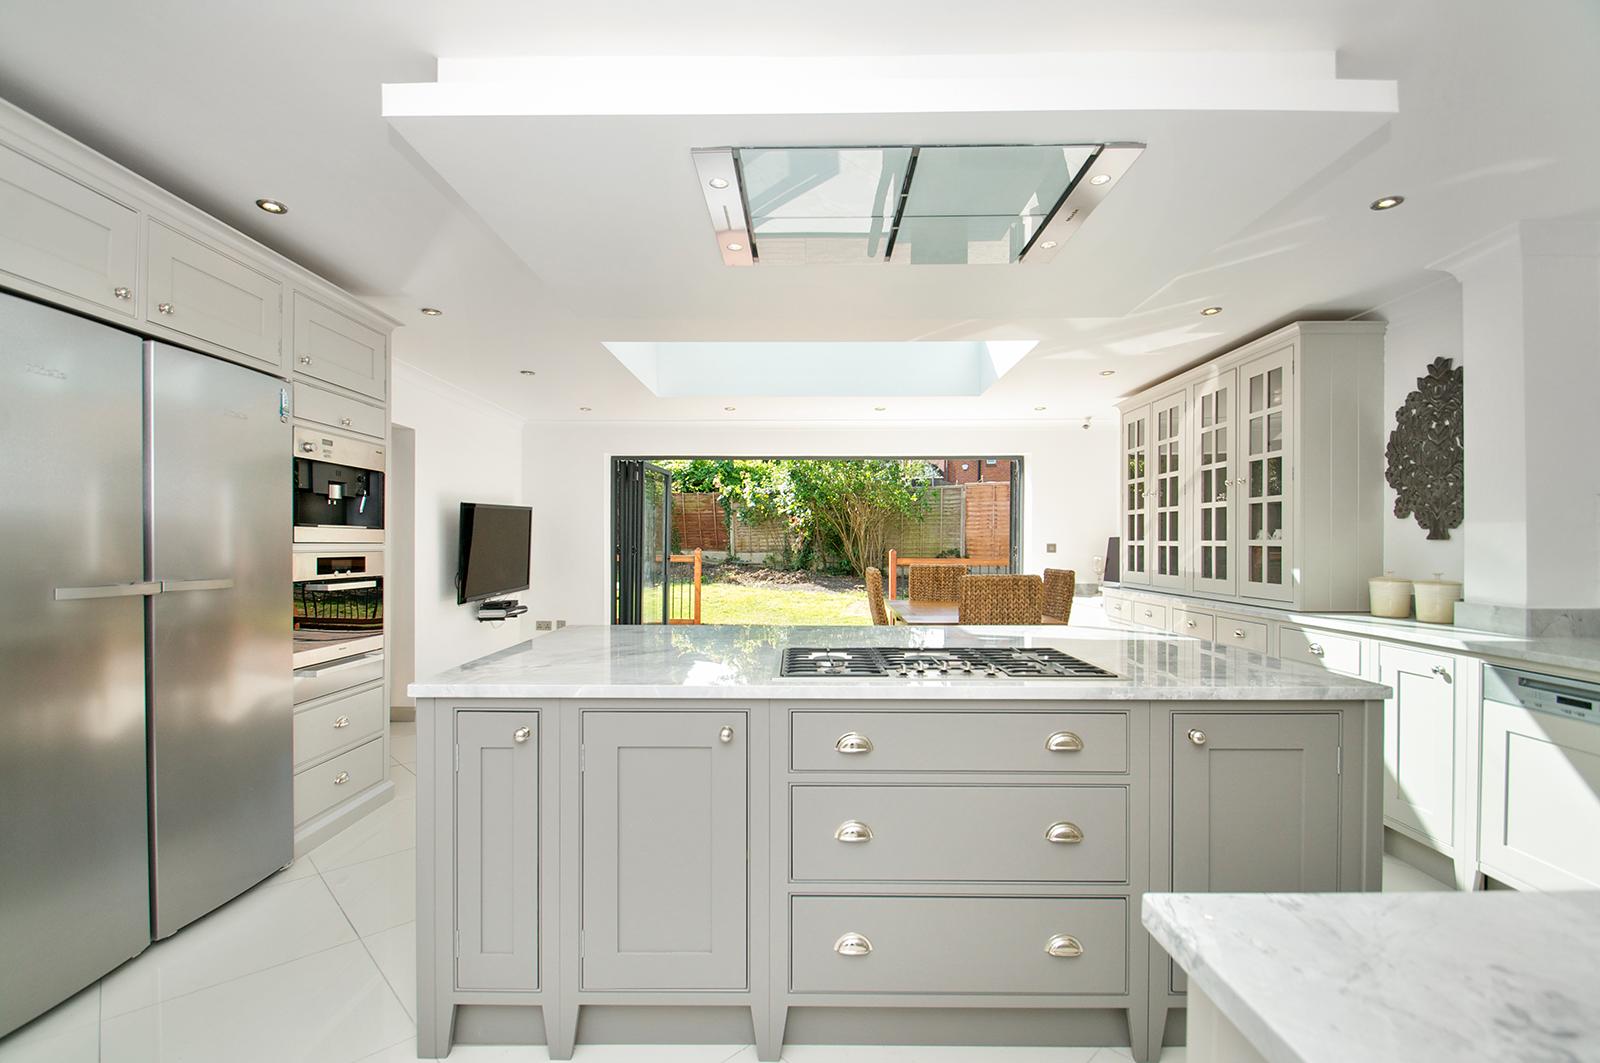 Bespoke Kitchen Design In Surrey | Shibui Joinery